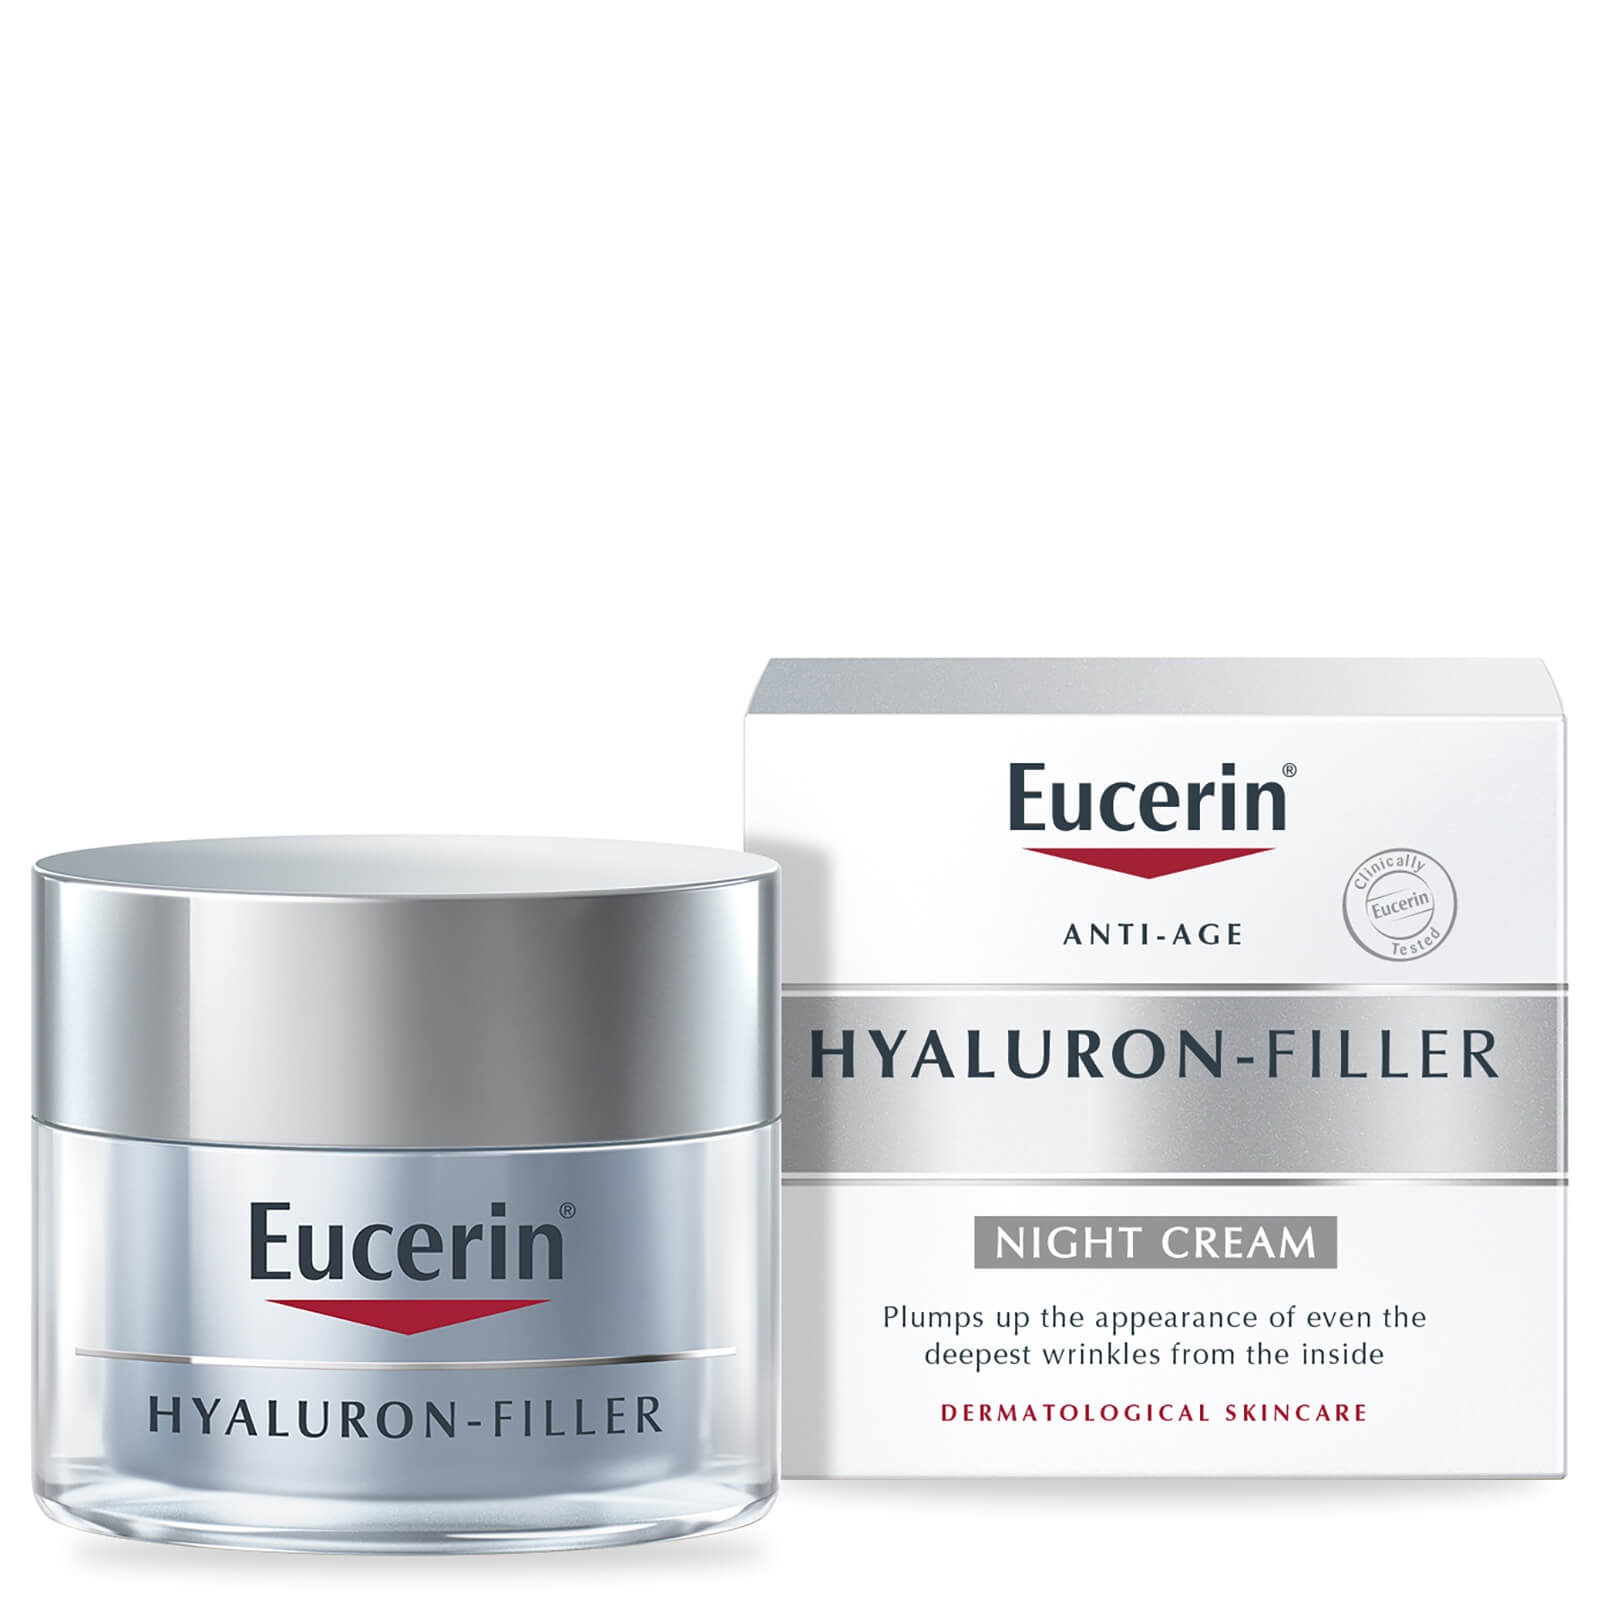 eucerin hyaluron filler night